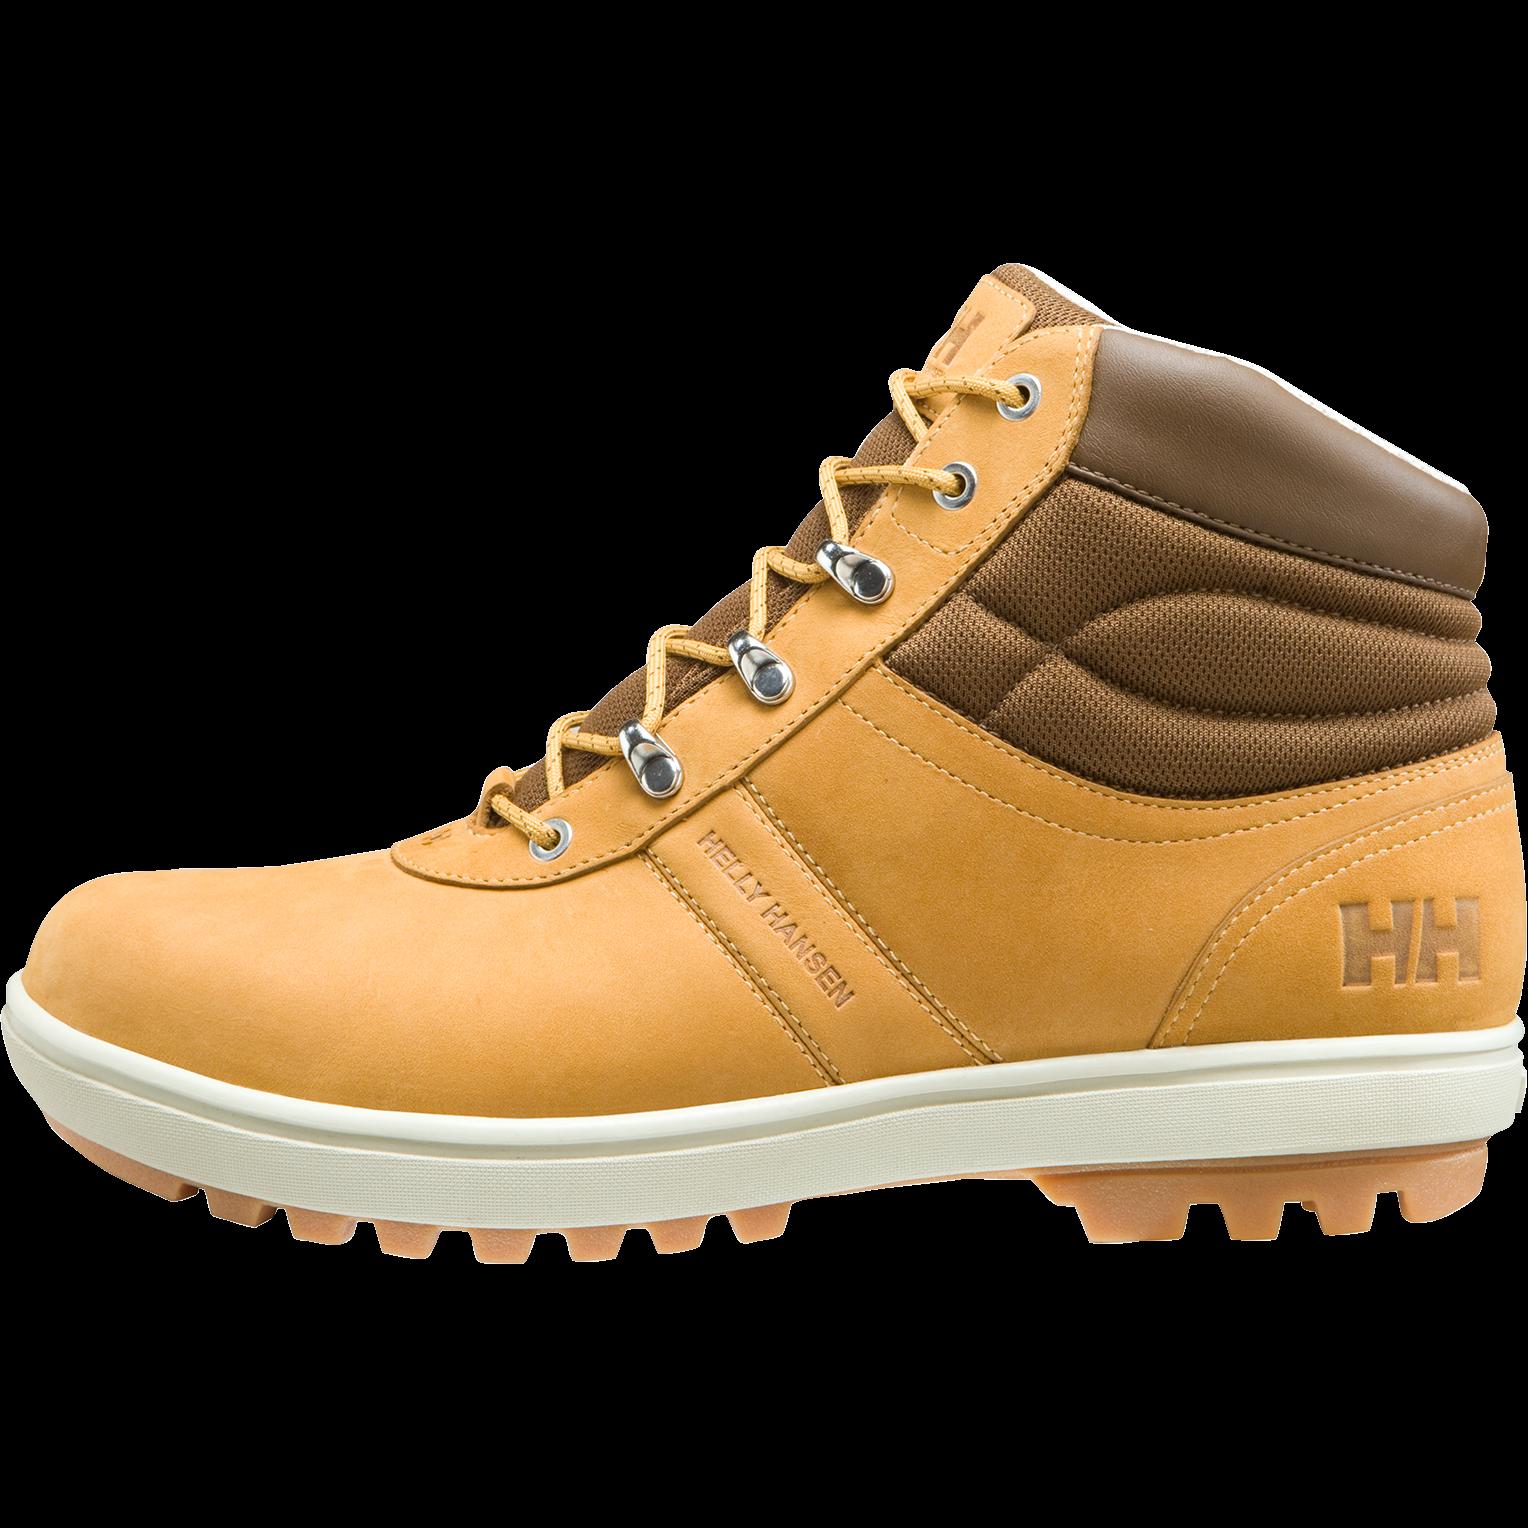 Zapatos casual Helly Hansen Montreal para hombre T7qO5cNUk